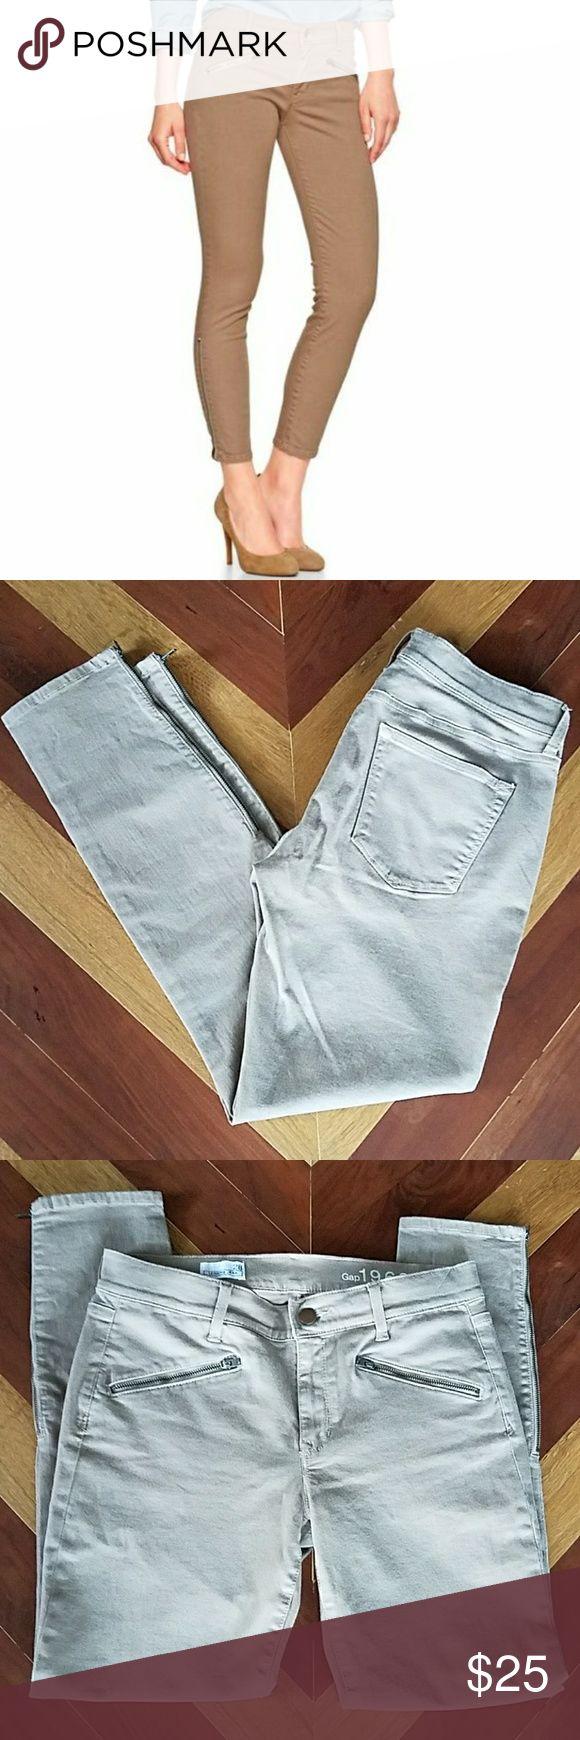 "Gap Khaki Zipper Ankle Legging Jeans Khaki legging jeans. Ankle length. Zipper front pockets and at ankle size seam. All zippers work. No major wear, in great shape.   Waist =14.5"" Inseam =26.5"" Leg opening =5"" GAP Jeans Ankle & Cropped"